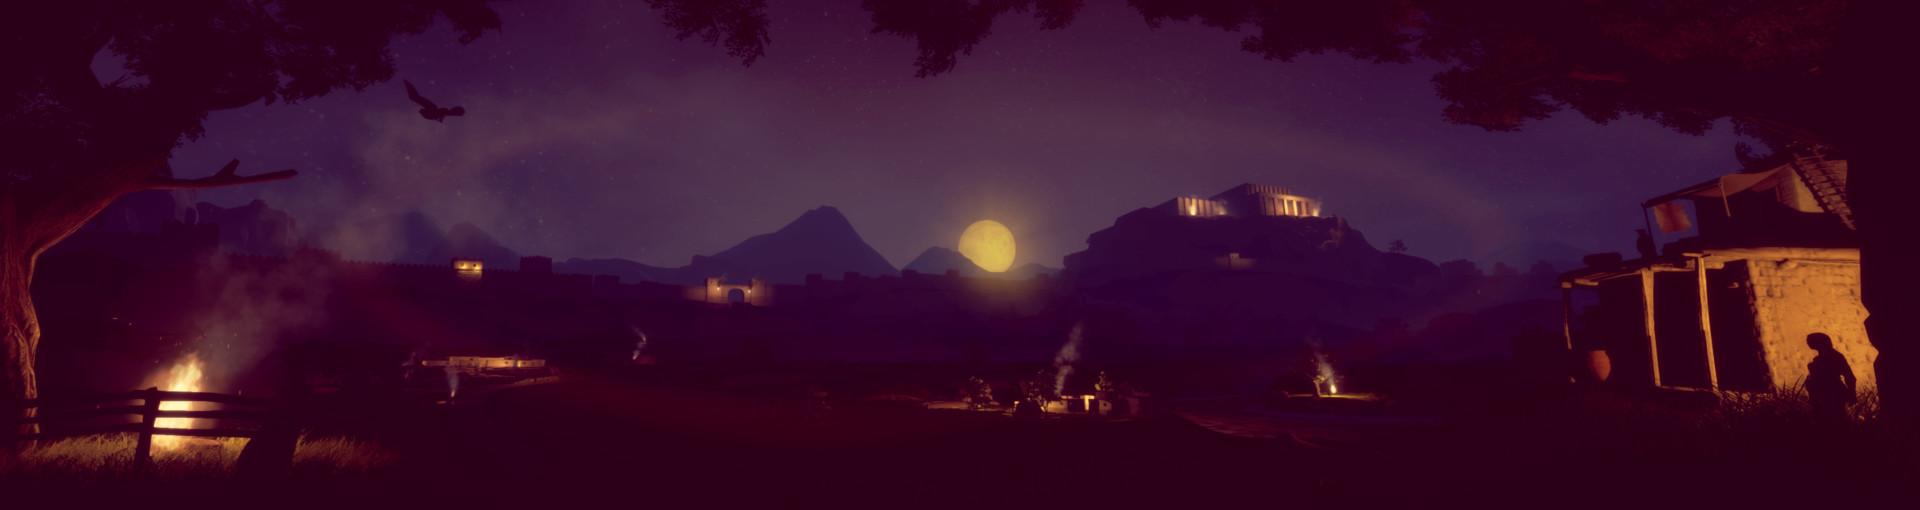 Screenshot from midnight